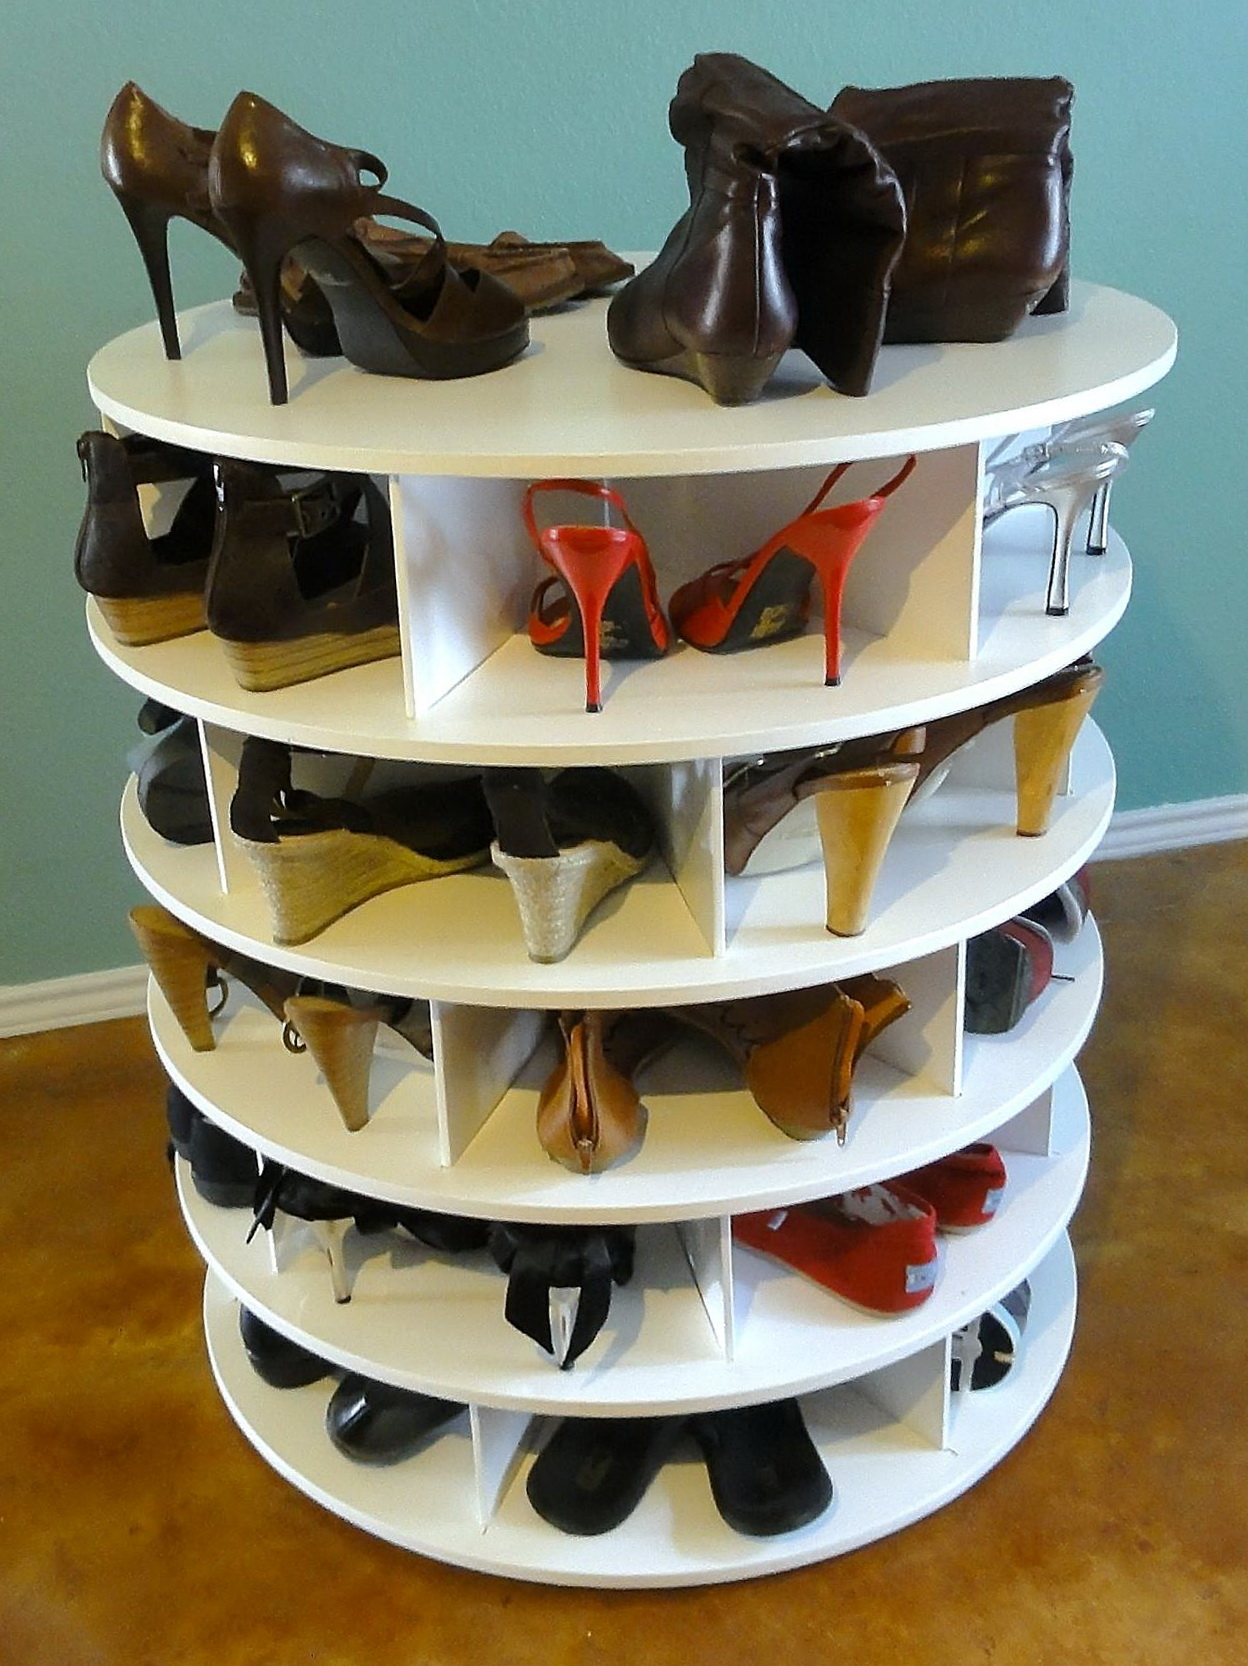 Spinning Closet Shoe Organizer